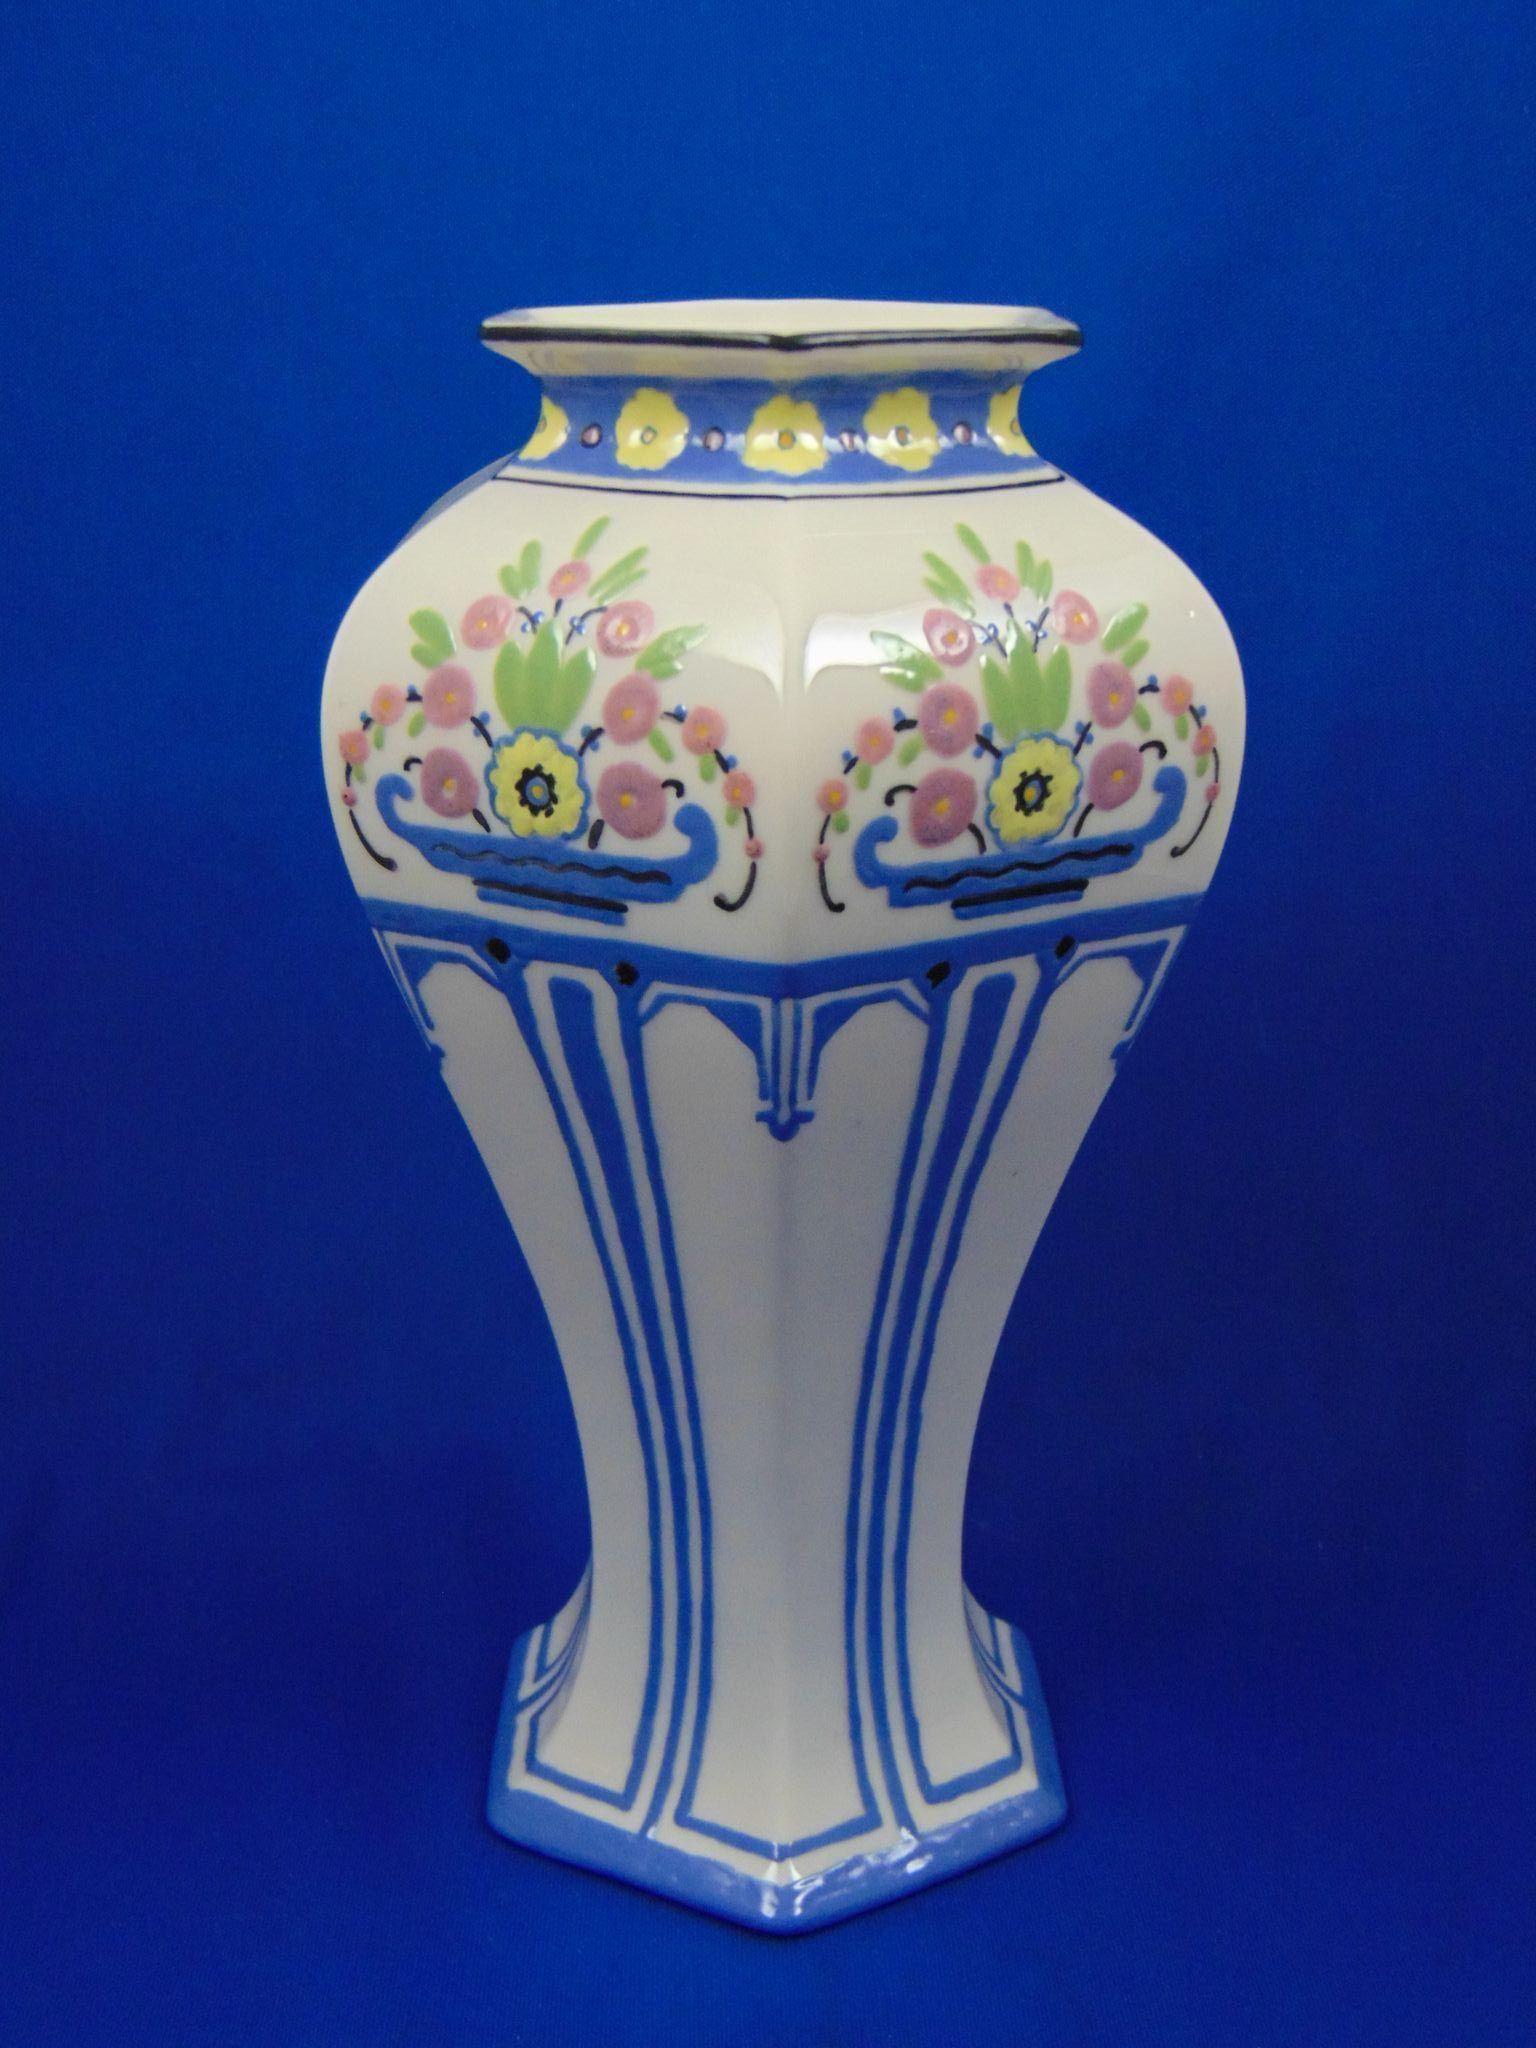 Lenox belleek arts crafts enameled floral design vase signed lenox belleek arts crafts enameled floral design vase signed ahvc floridaeventfo Image collections